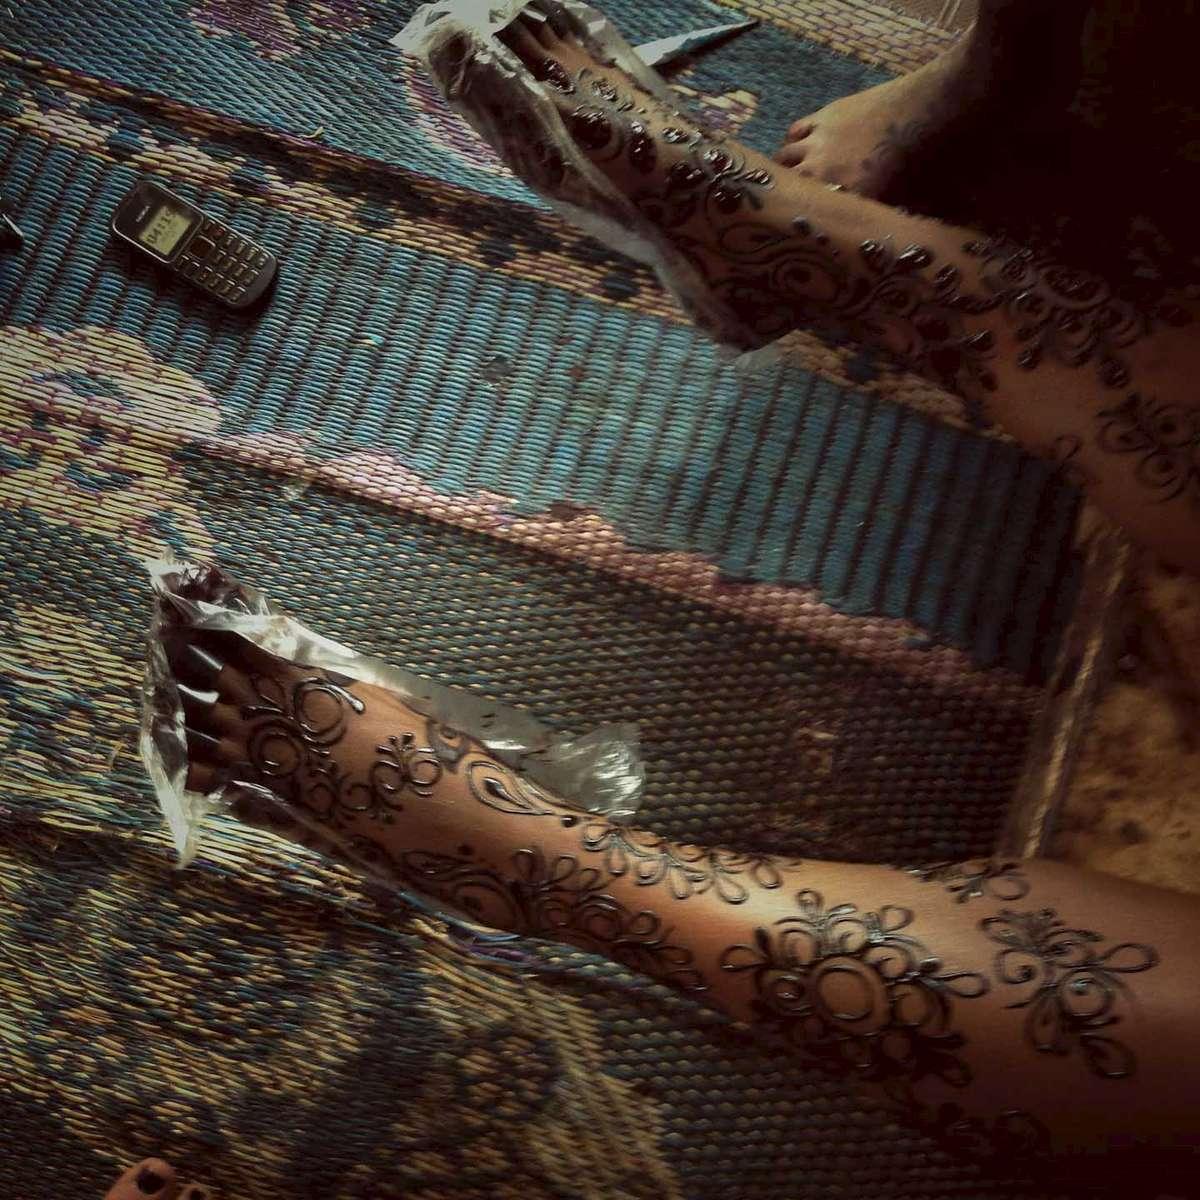 Henna\'ed feet. Kano, Northern Nigeria. February 2014.